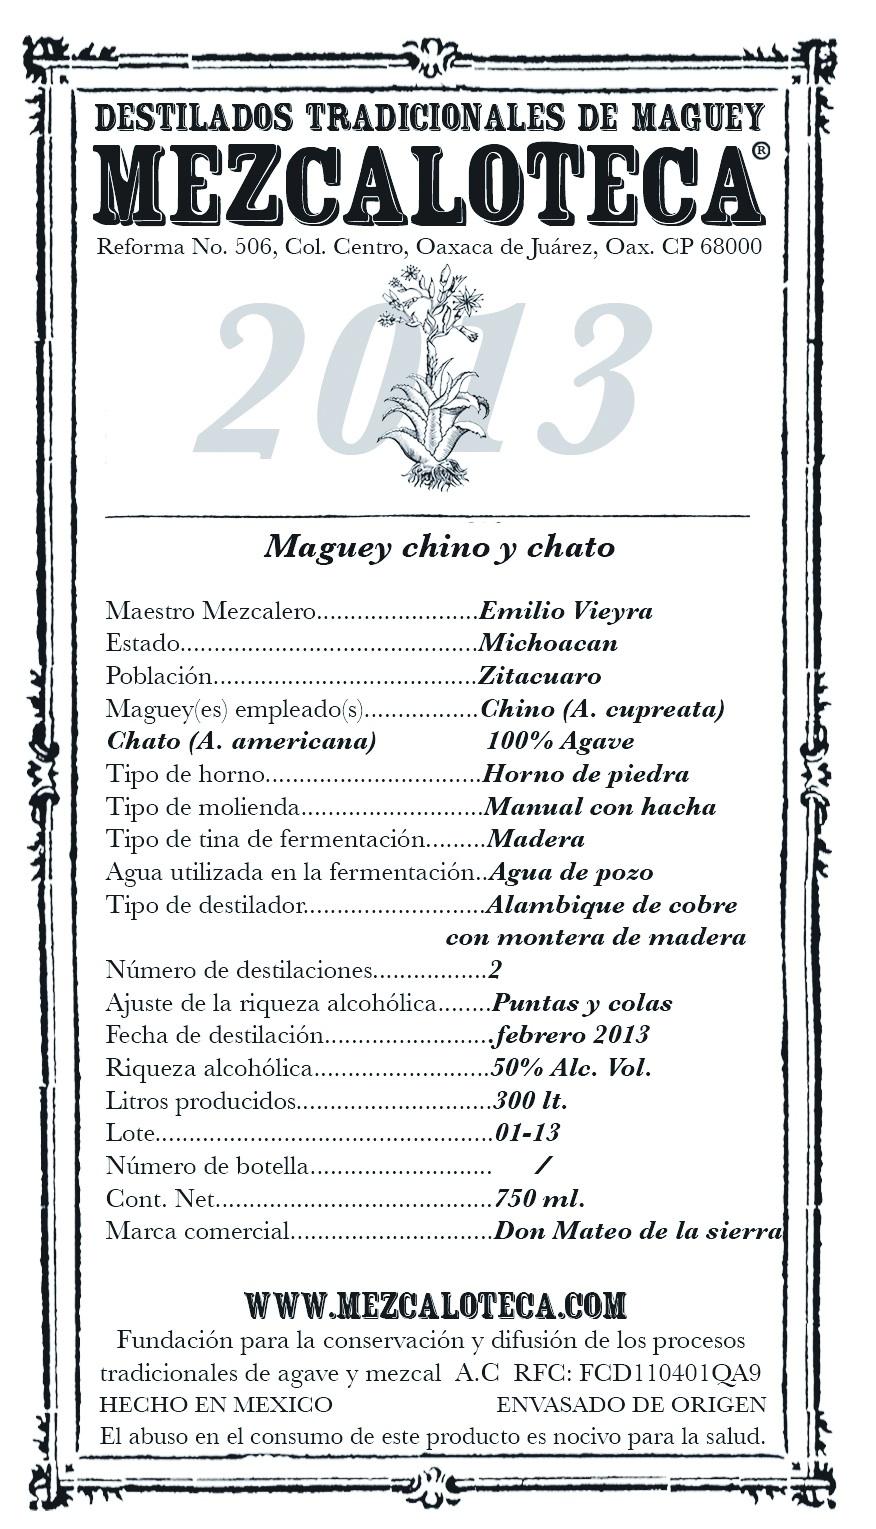 michoacan.EV.chino.chato.750.2013 web.jpg